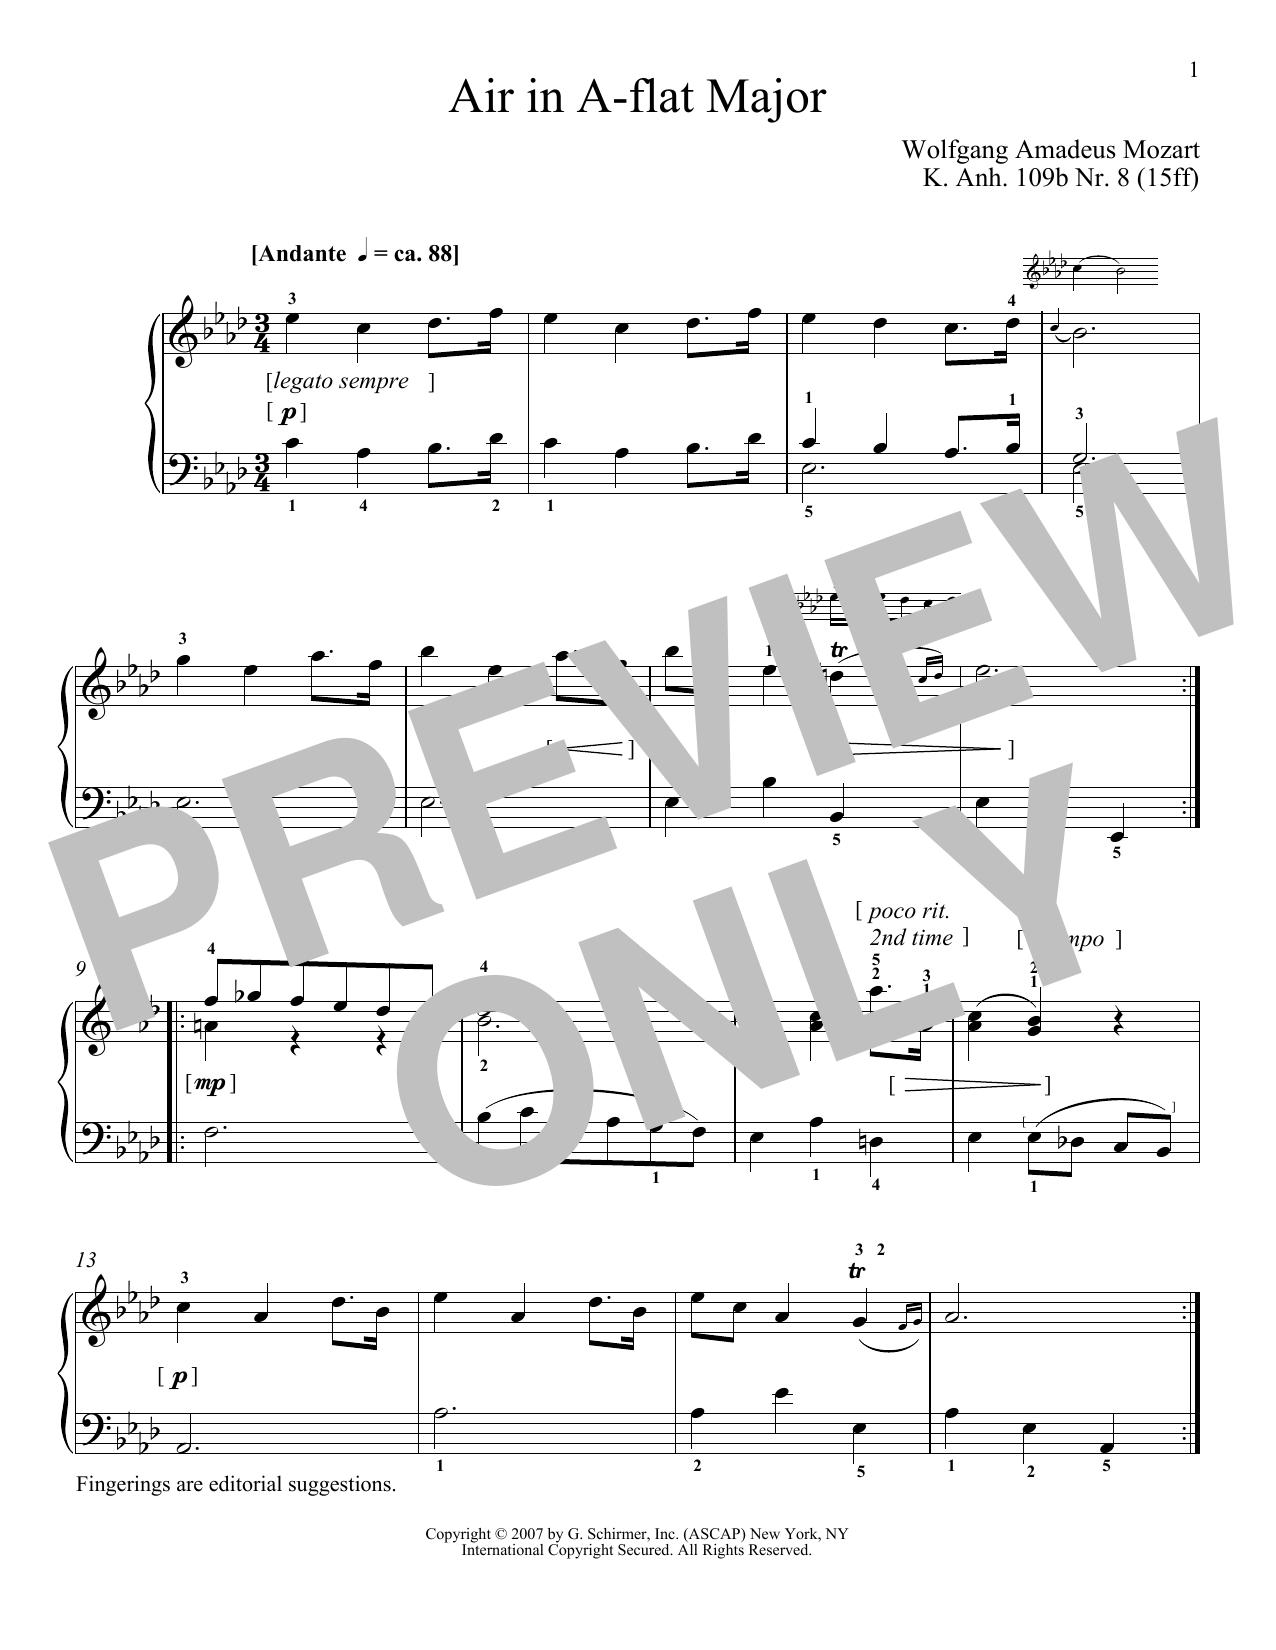 Wolfgang Amadeus Mozart Air In A-Flat Major, K109b, No. 8 sheet music notes and chords. Download Printable PDF.